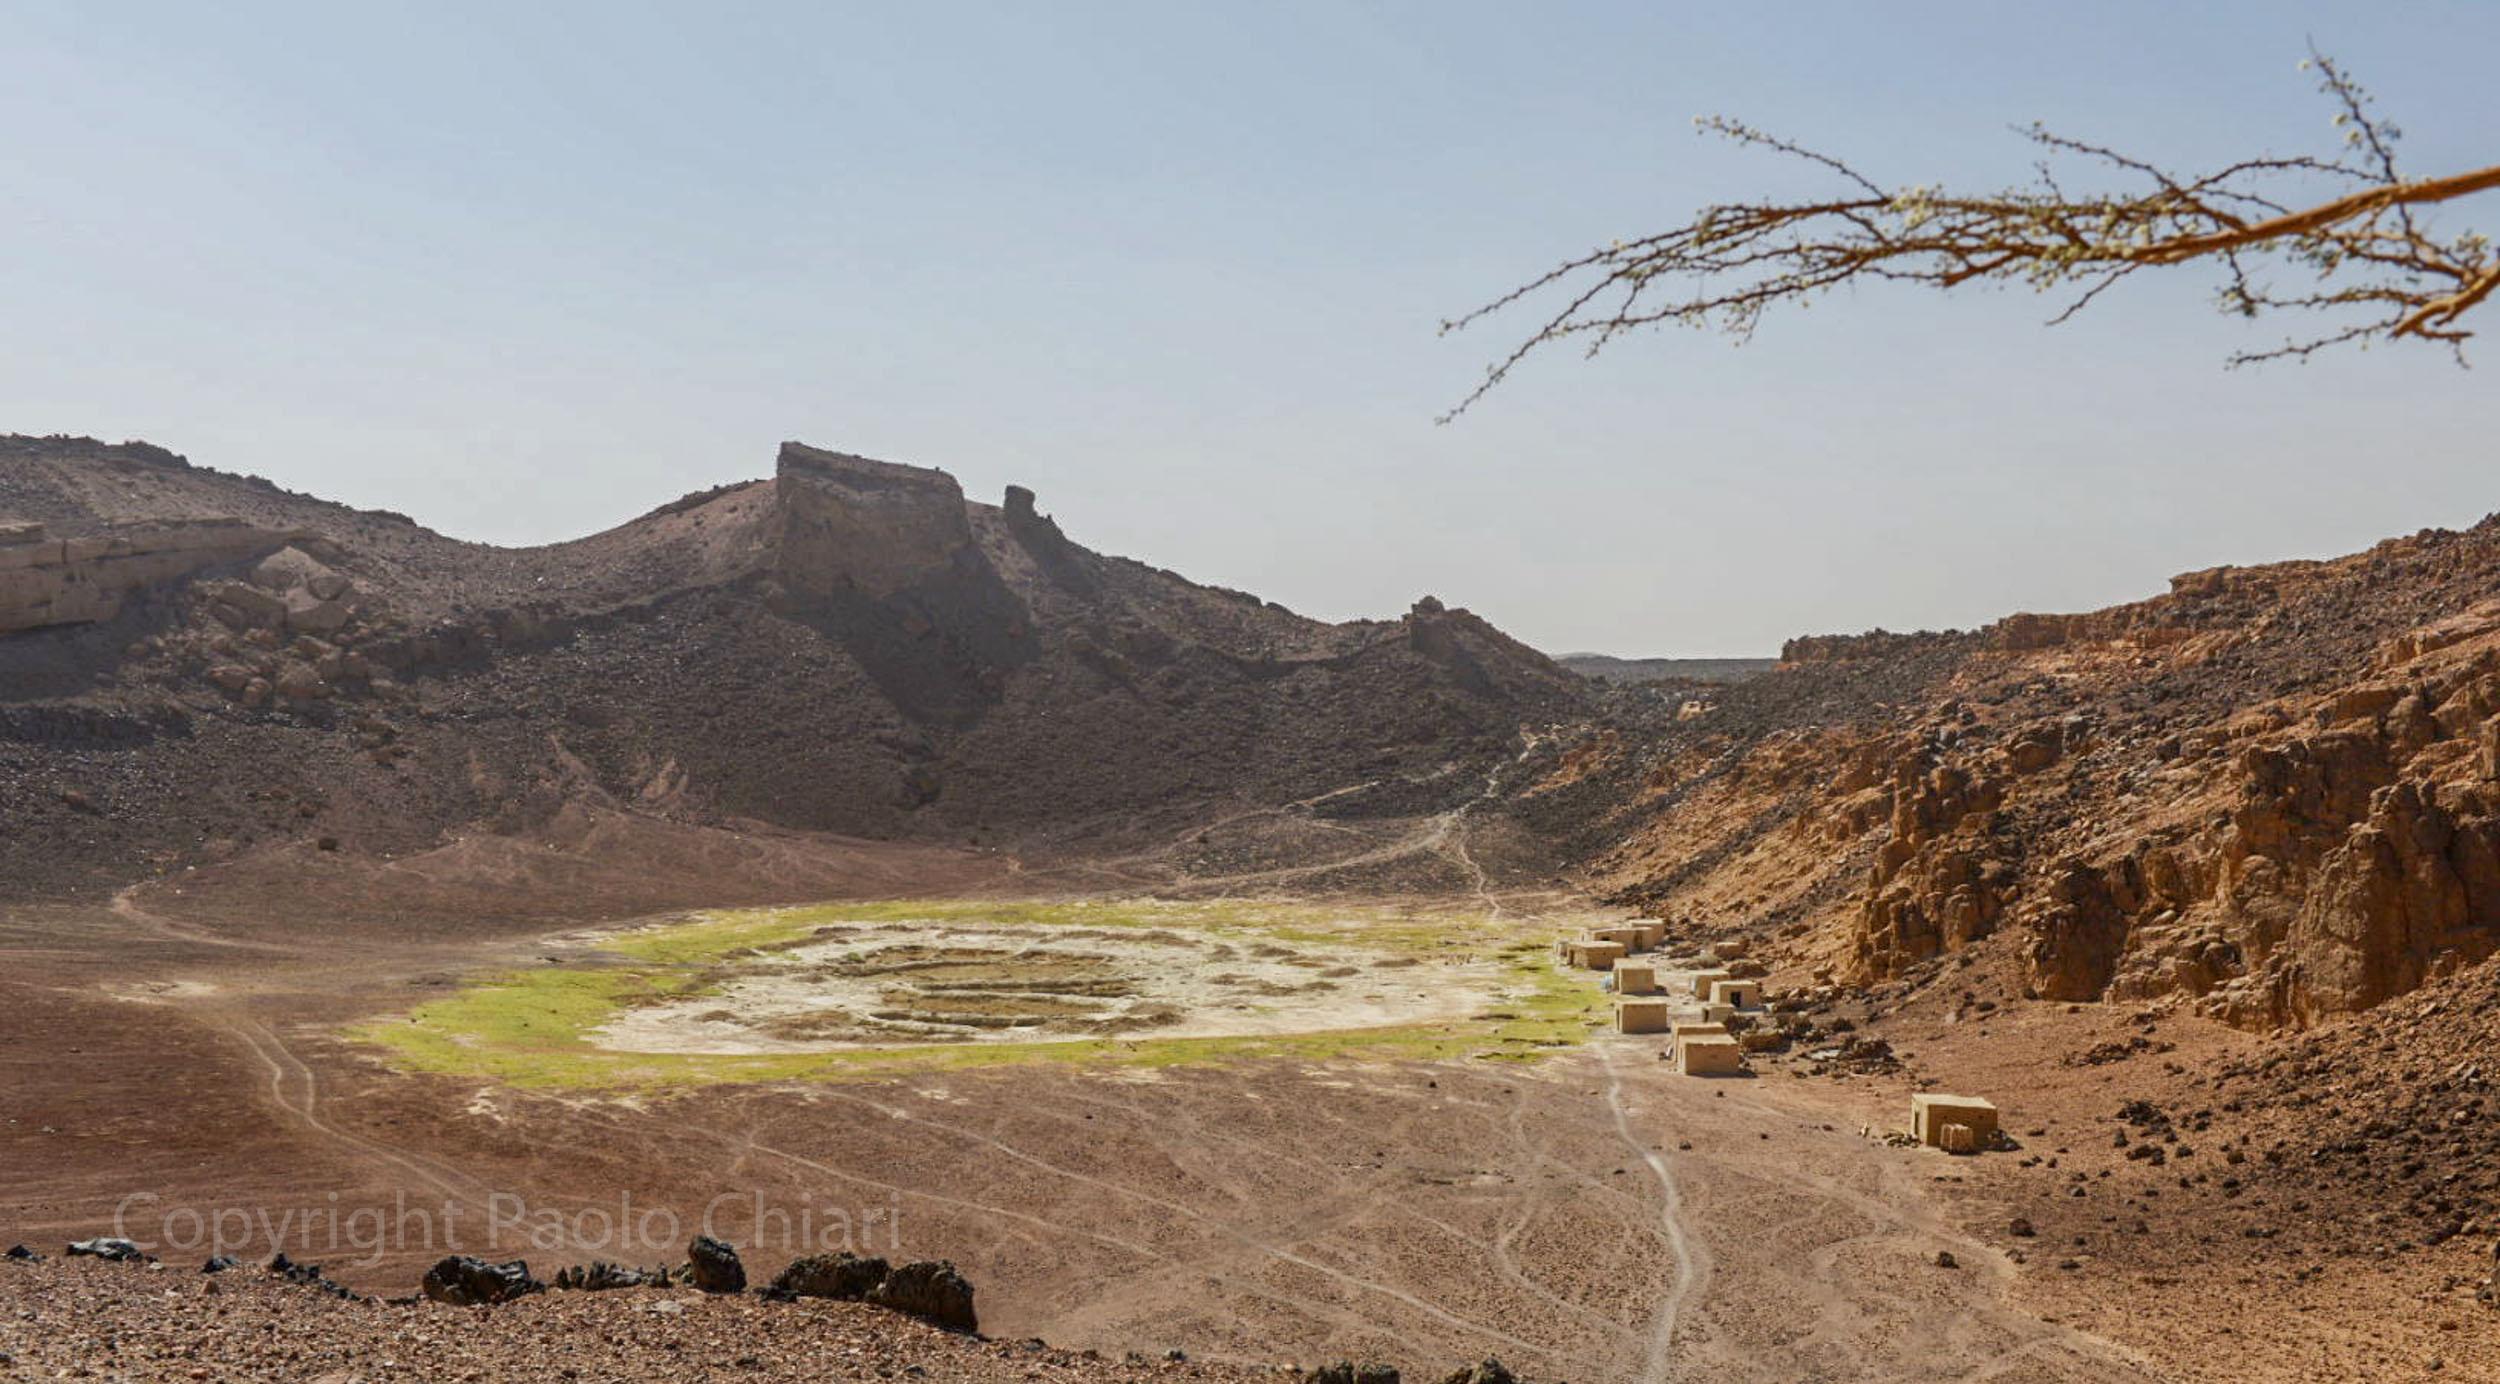 Sudan2013_0330